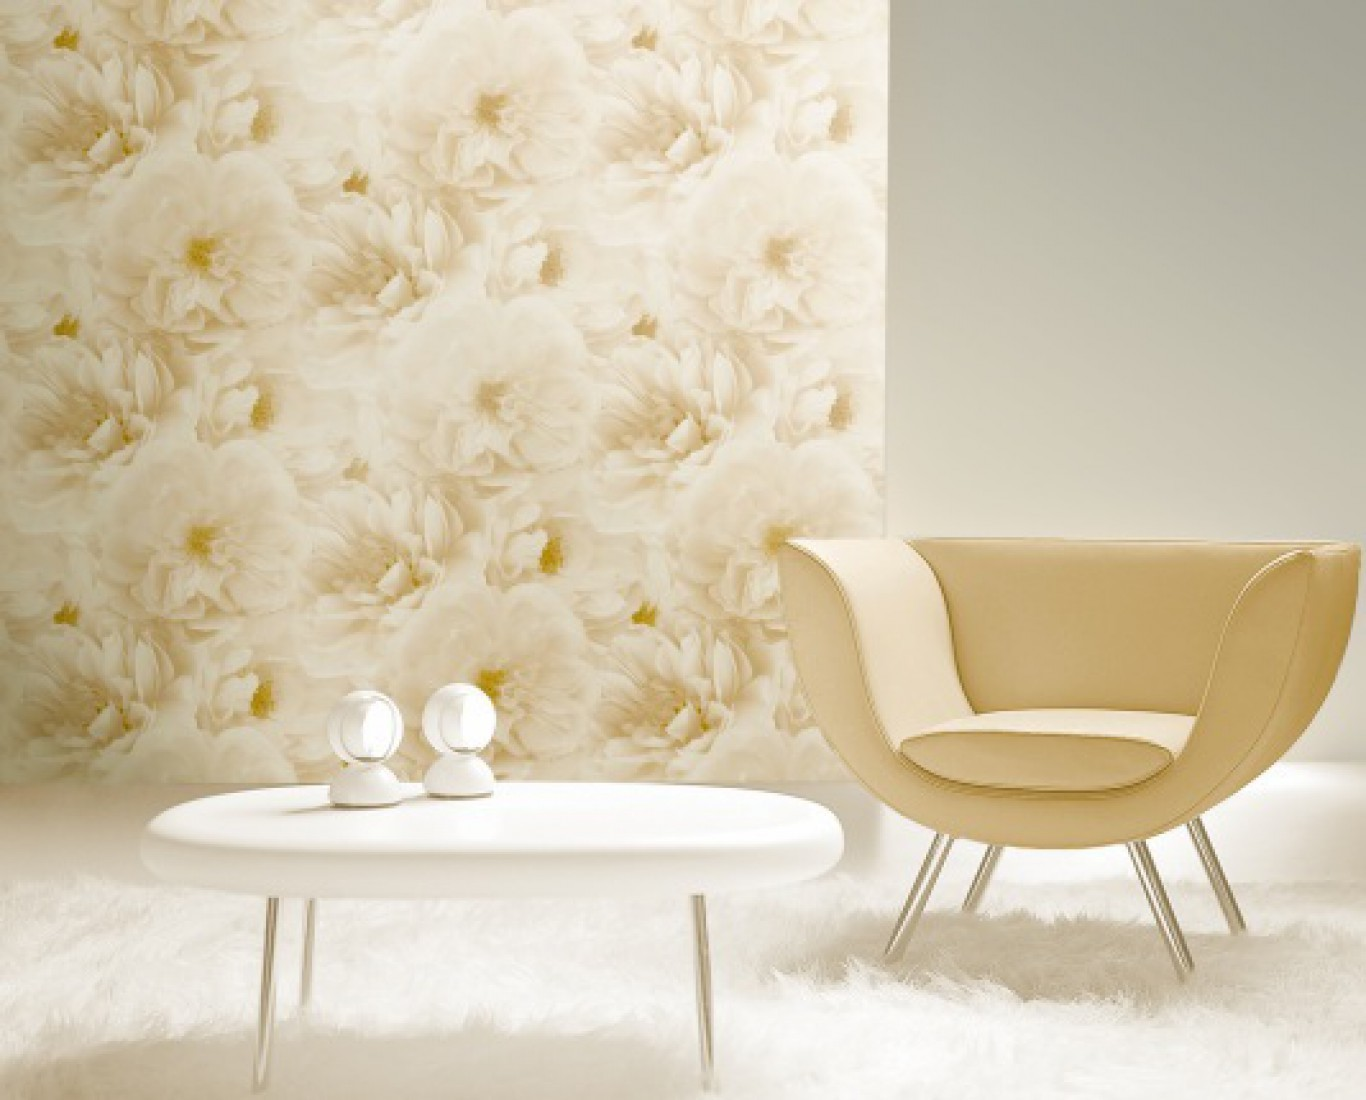 کاغذ دیواری گل دار رنگ روشن